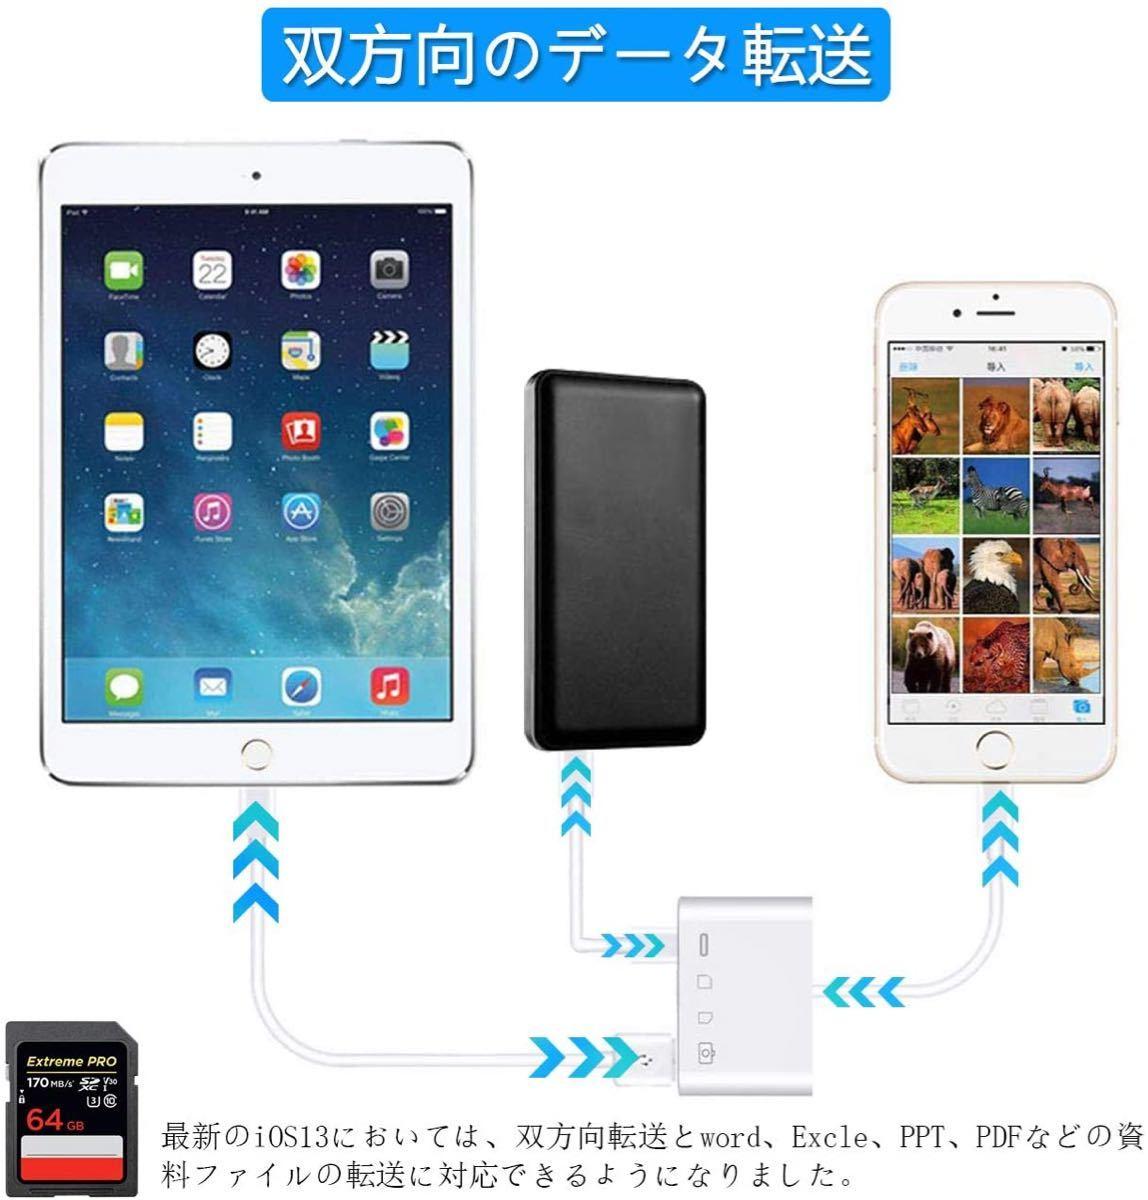 SDカードリーダー iPhone iPad Lightning 4in1 SD TFカード カメラリーダー 高速 iOS14 対応